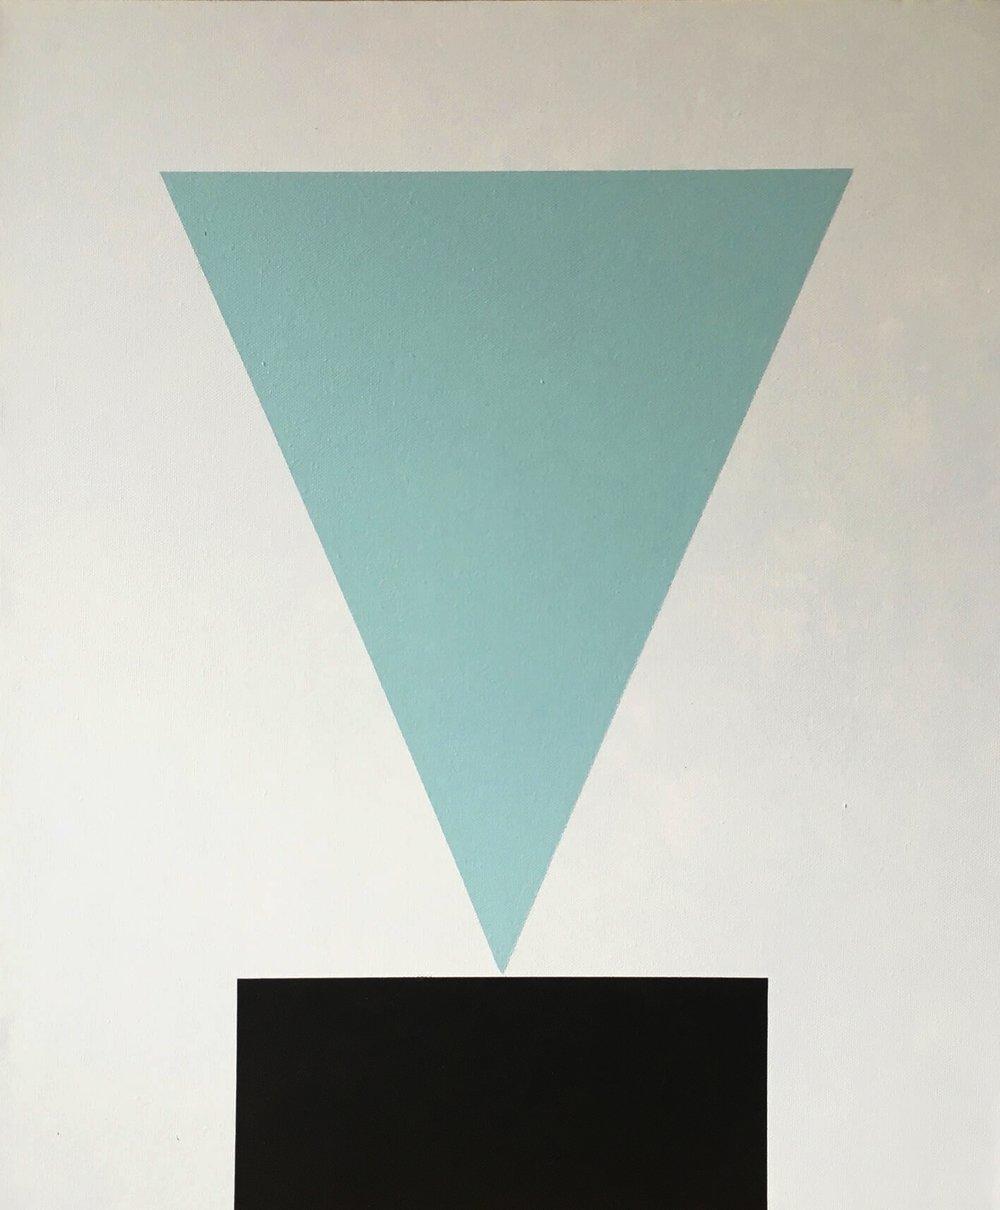 Minimal 12, 60 cm x 50 x 4 cm, Acryl auf Leinwand, Ute Latzke, 2016, Preis: 300 Euro.